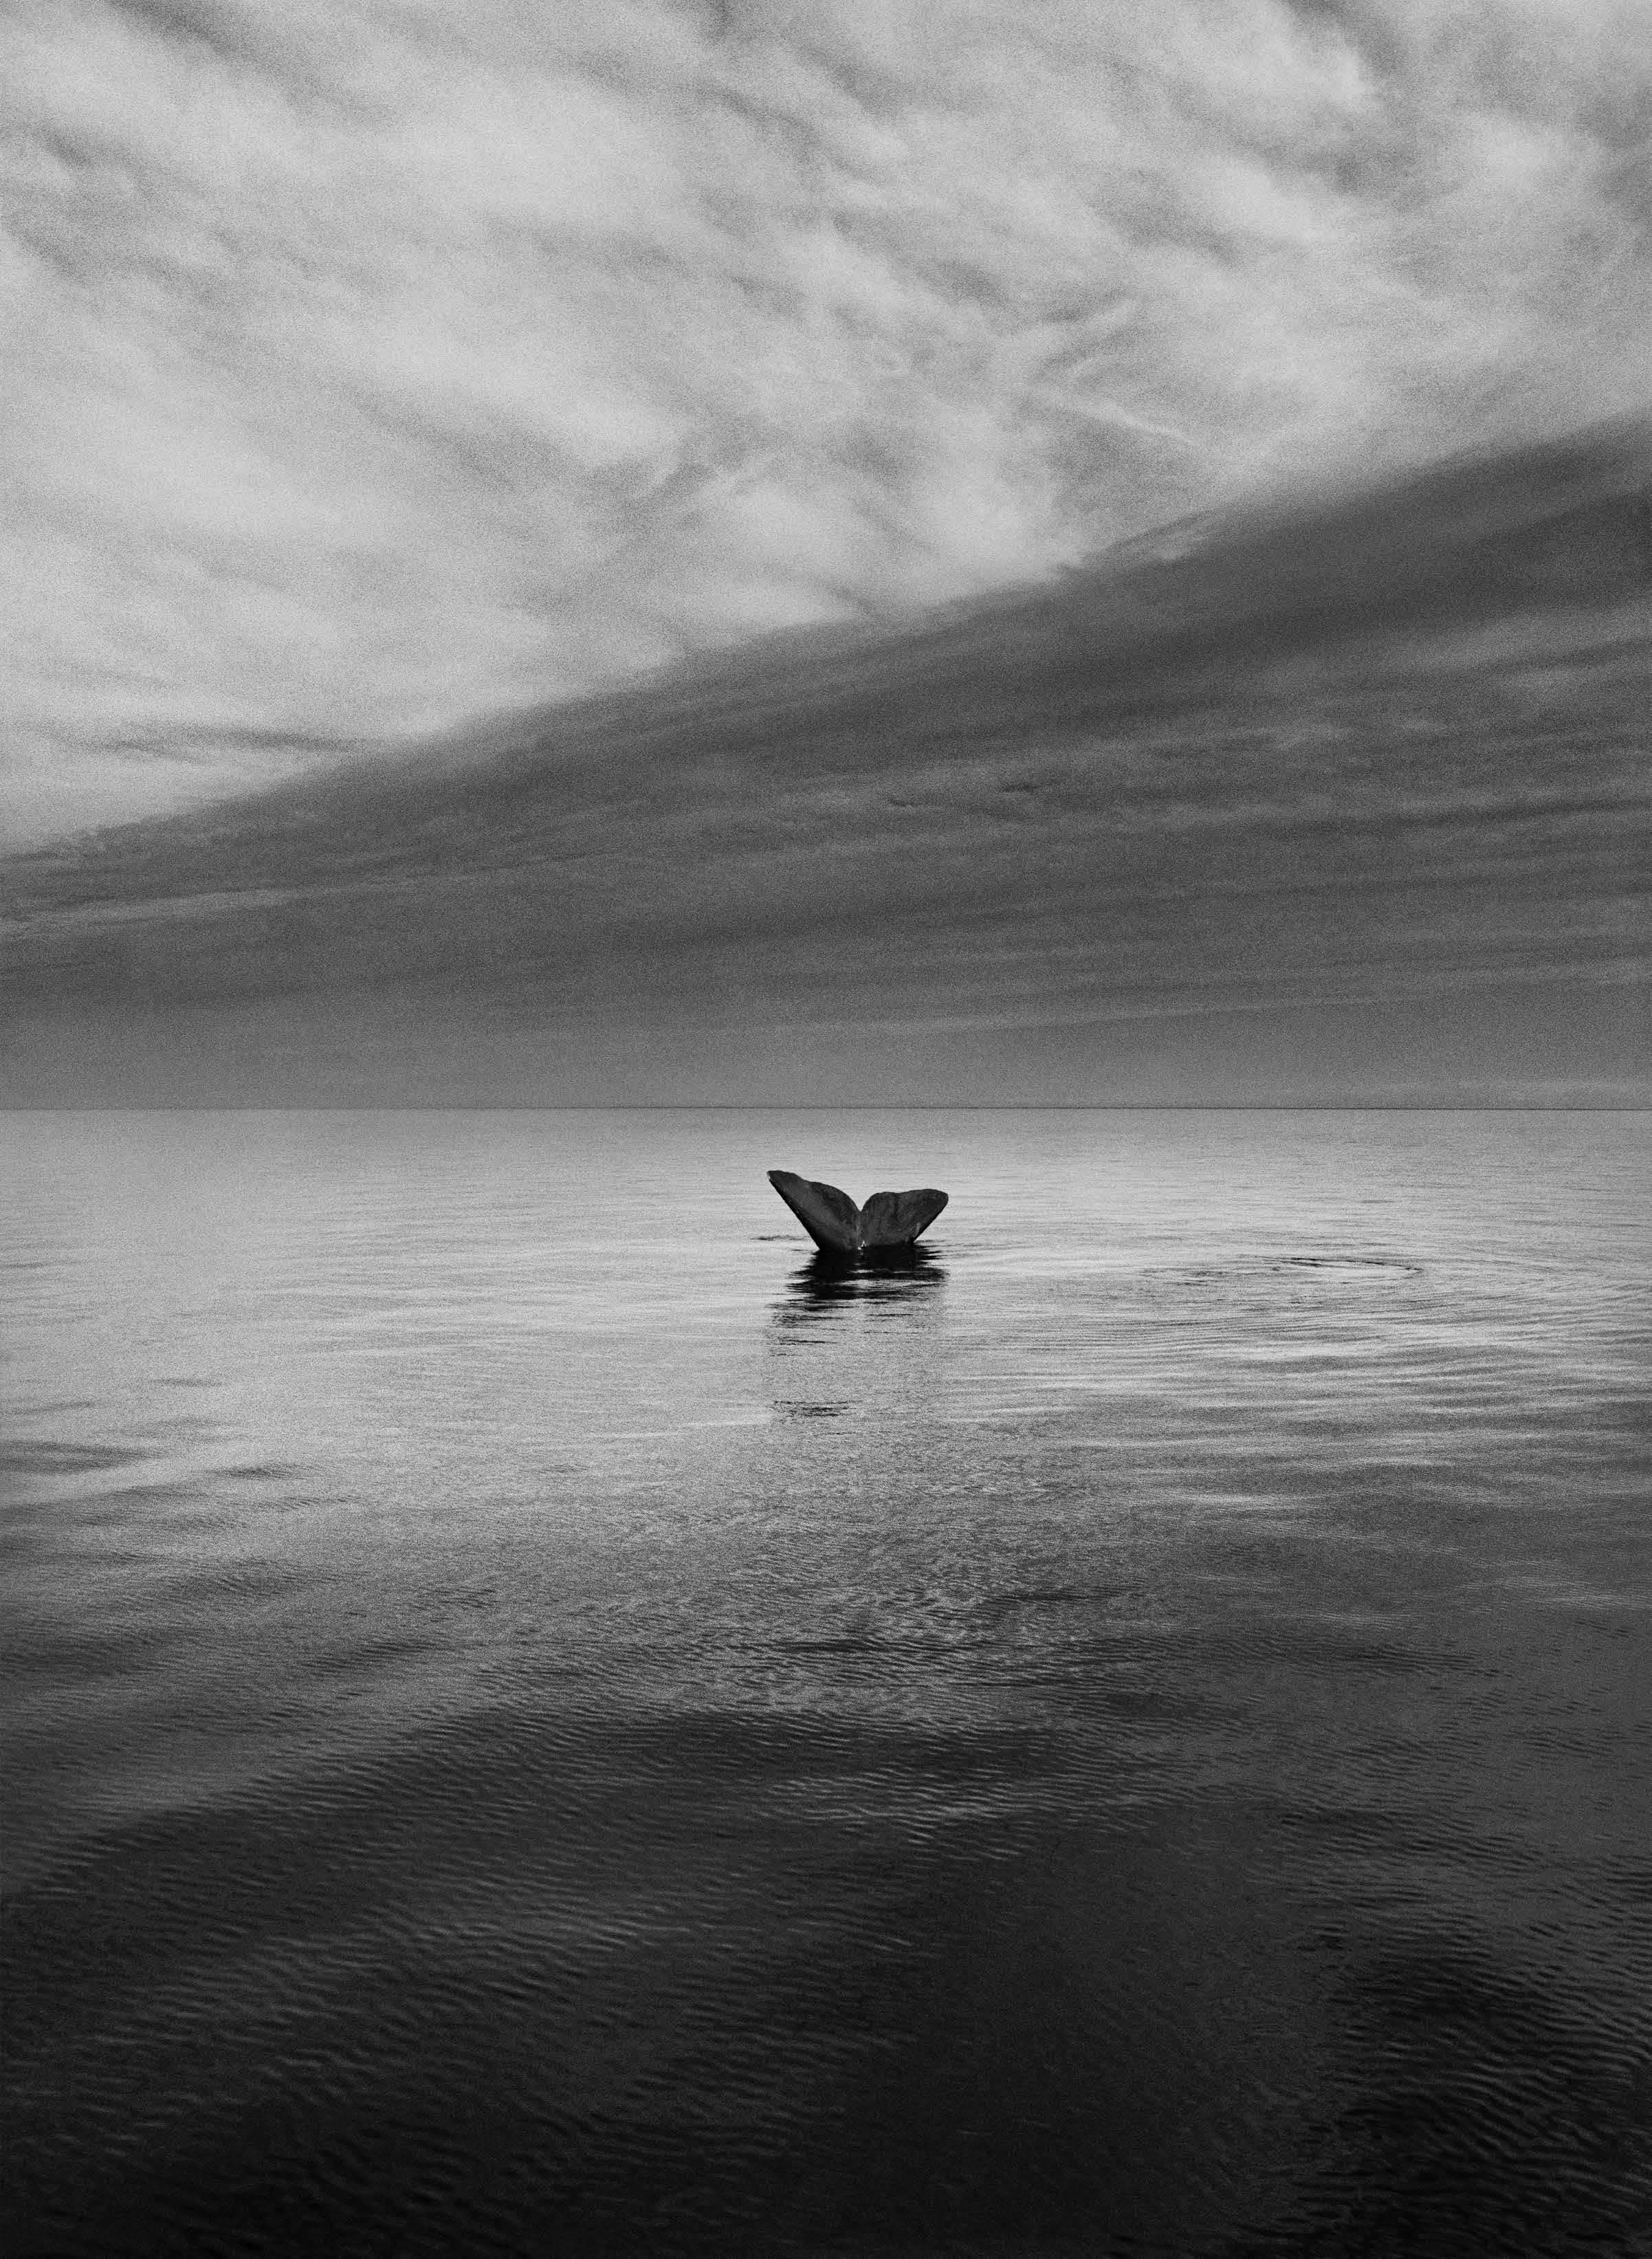 Southern Right Whale Tail, Valdes Peninsula, Argentina, 2004 - Sebastião Salgado